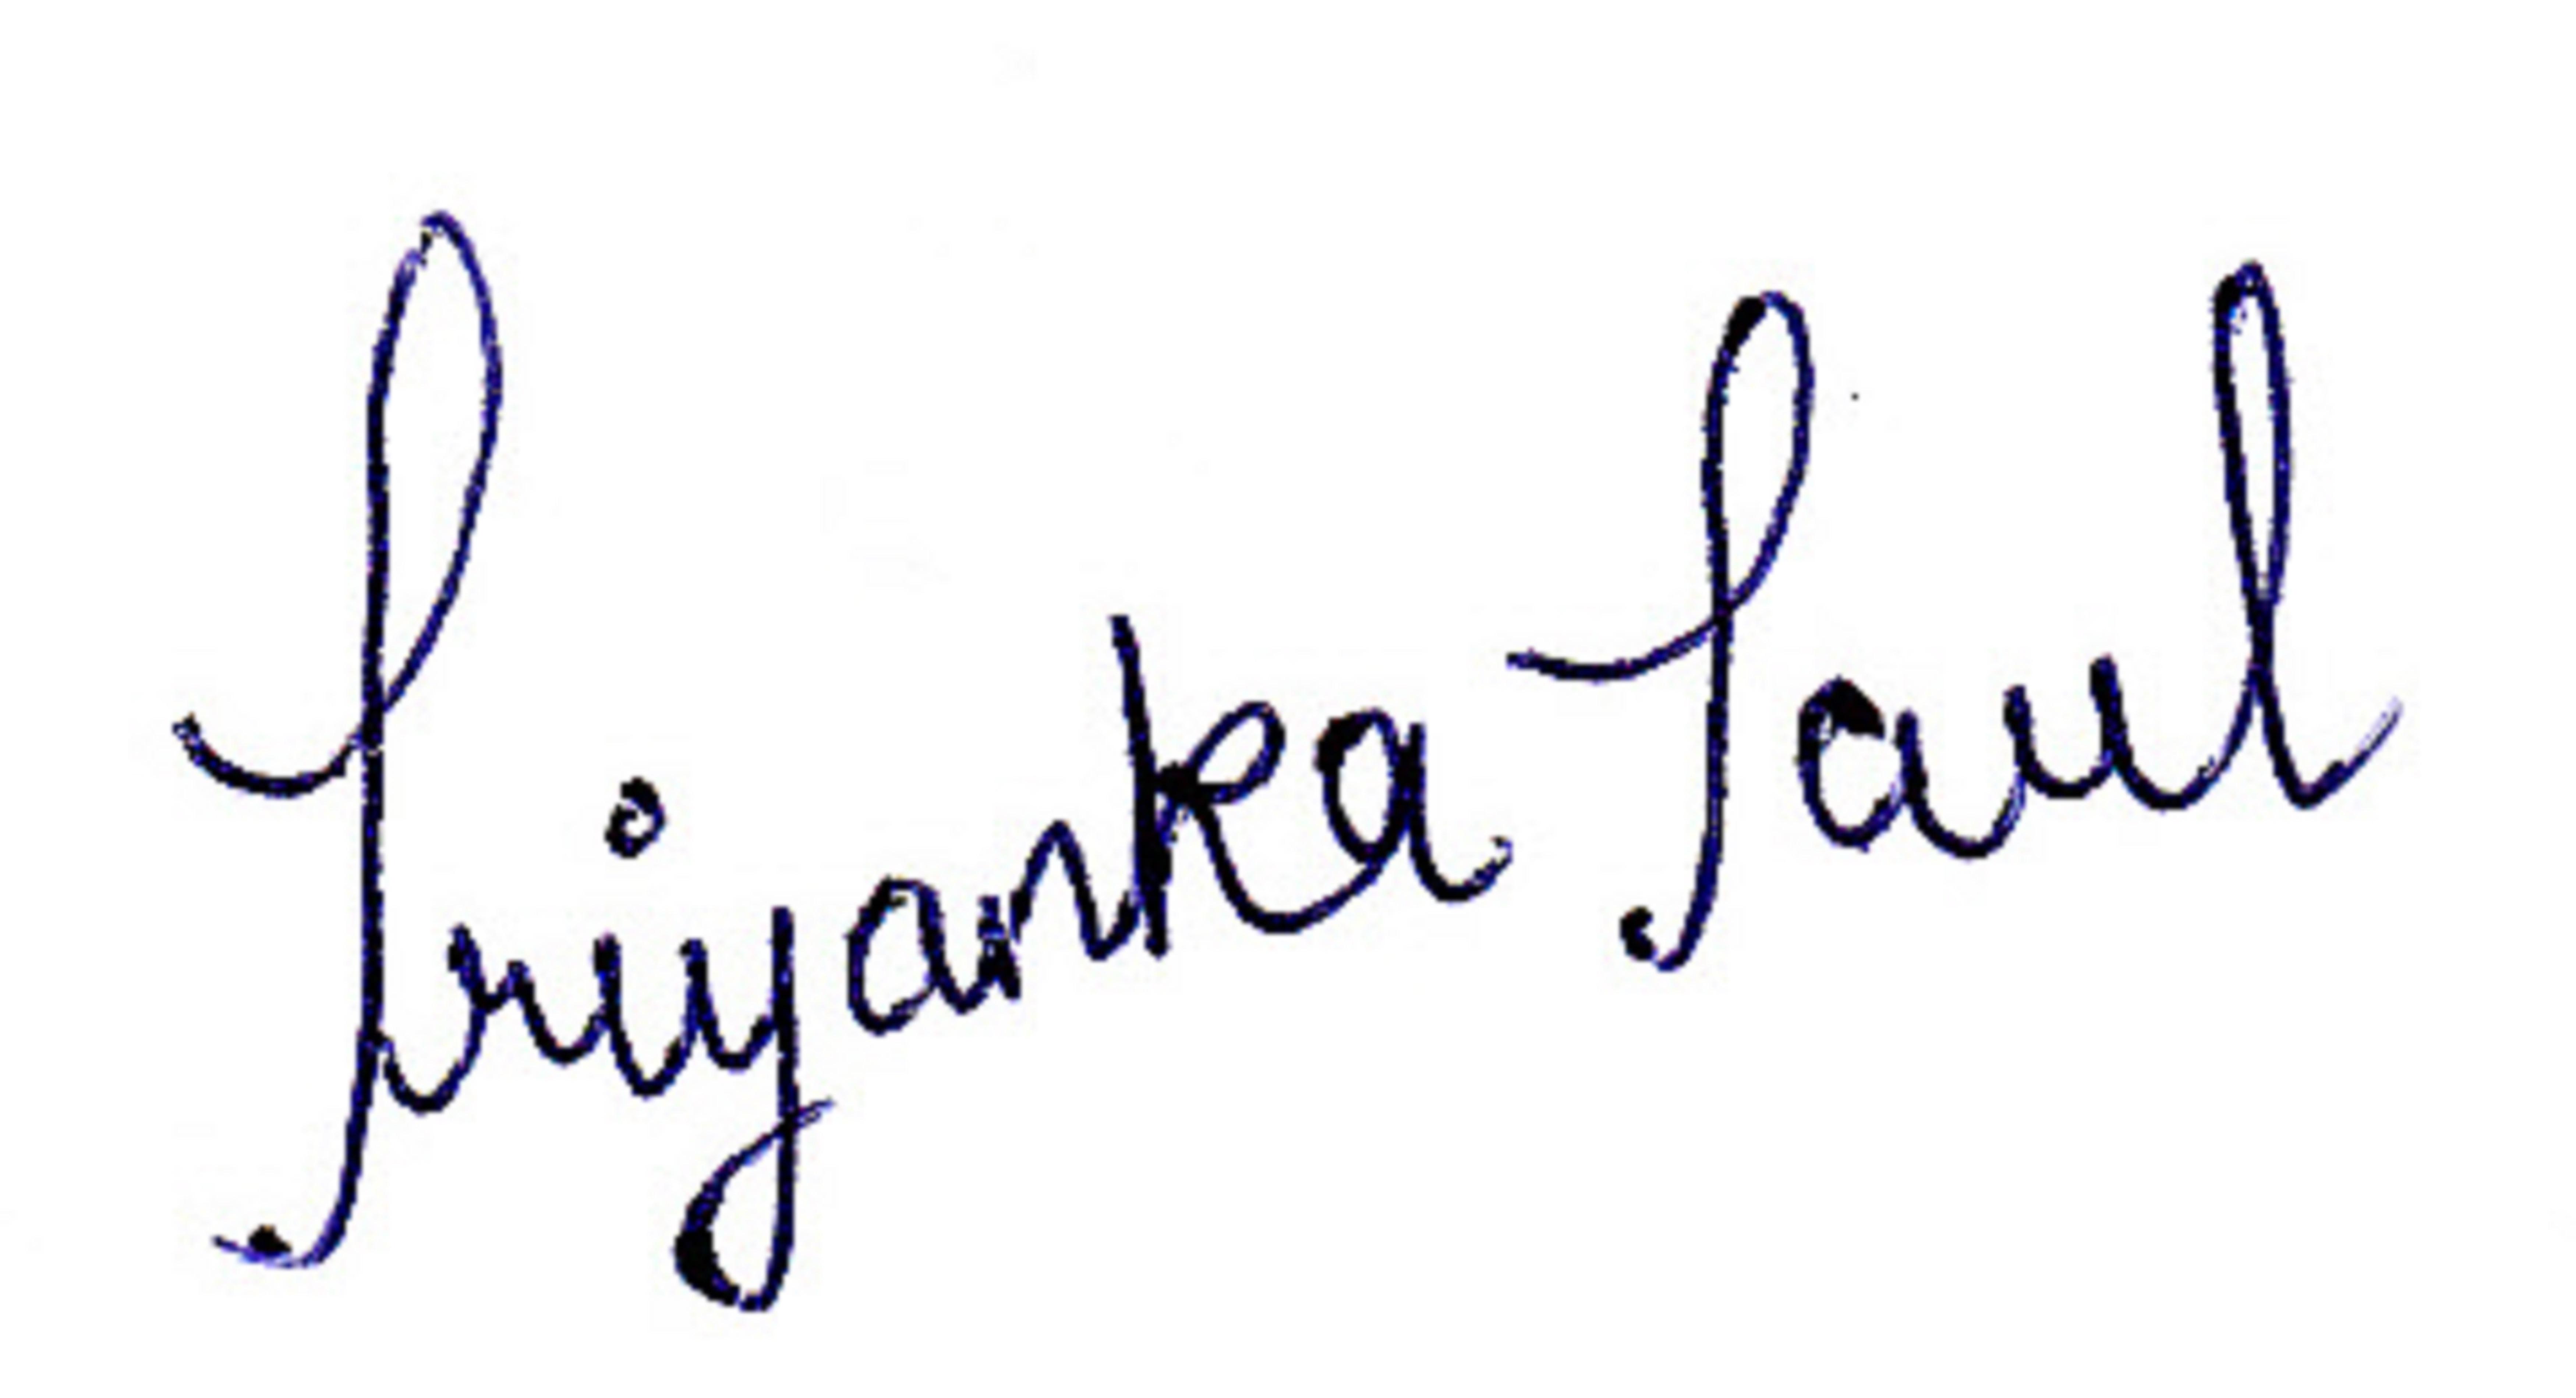 Priyanka Paul's Signature